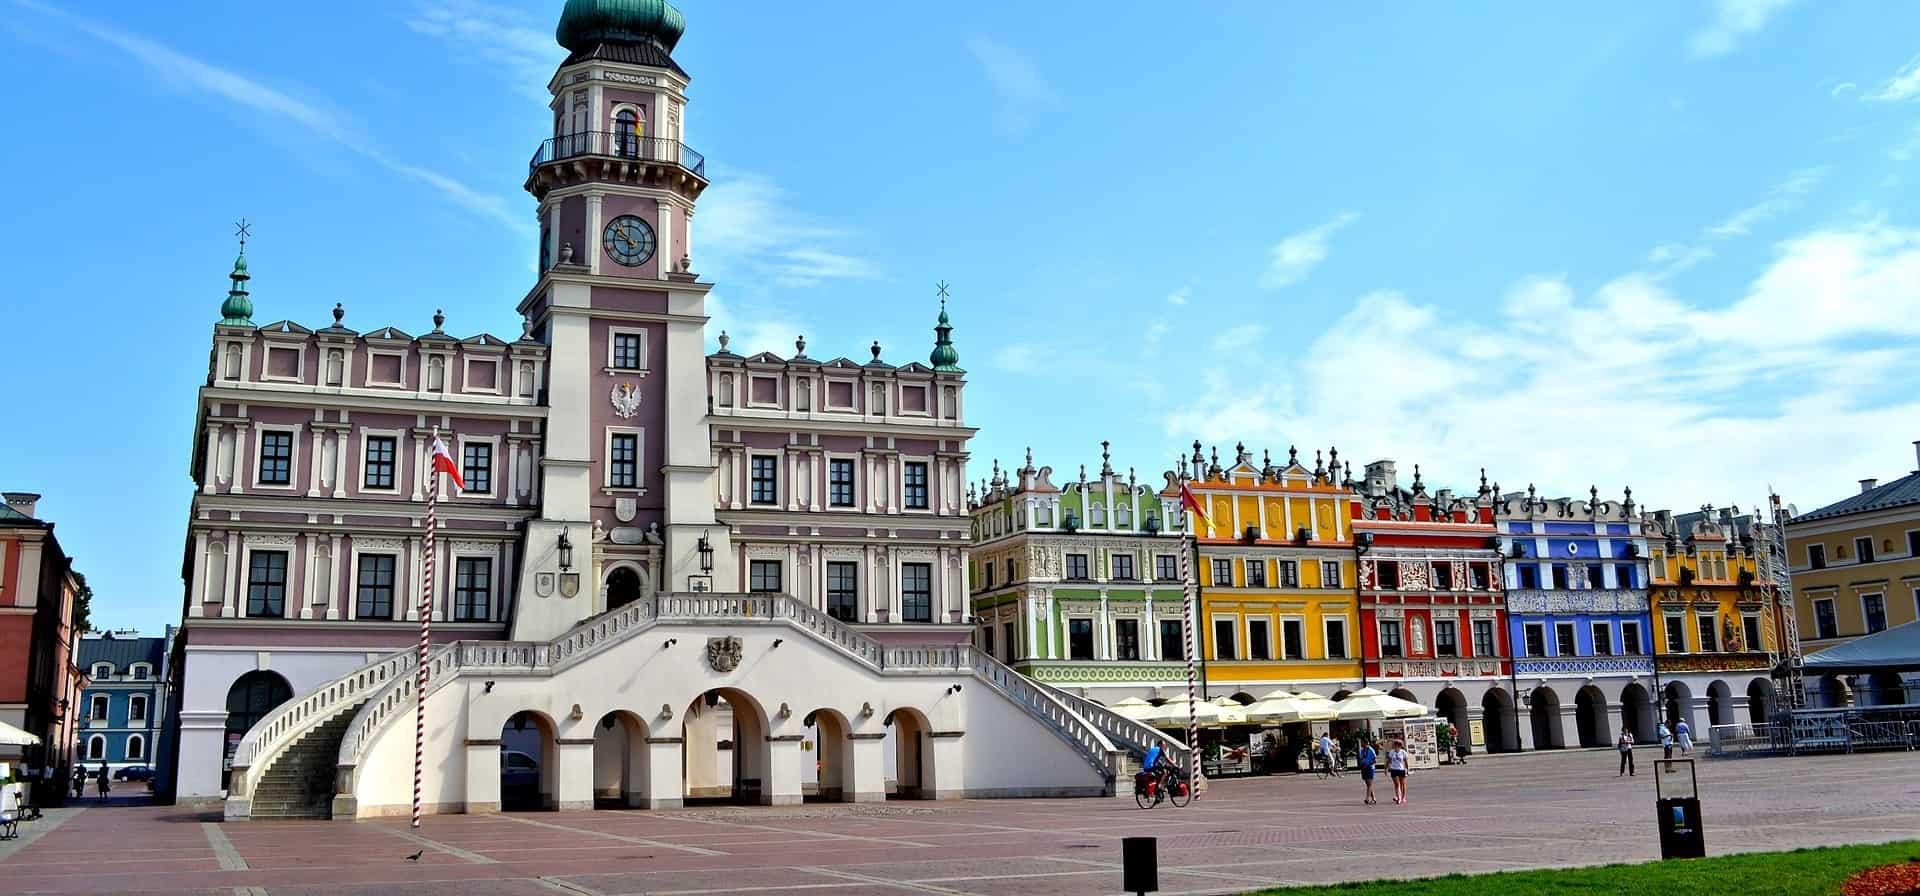 Lugares del centro histórico de Cracovia